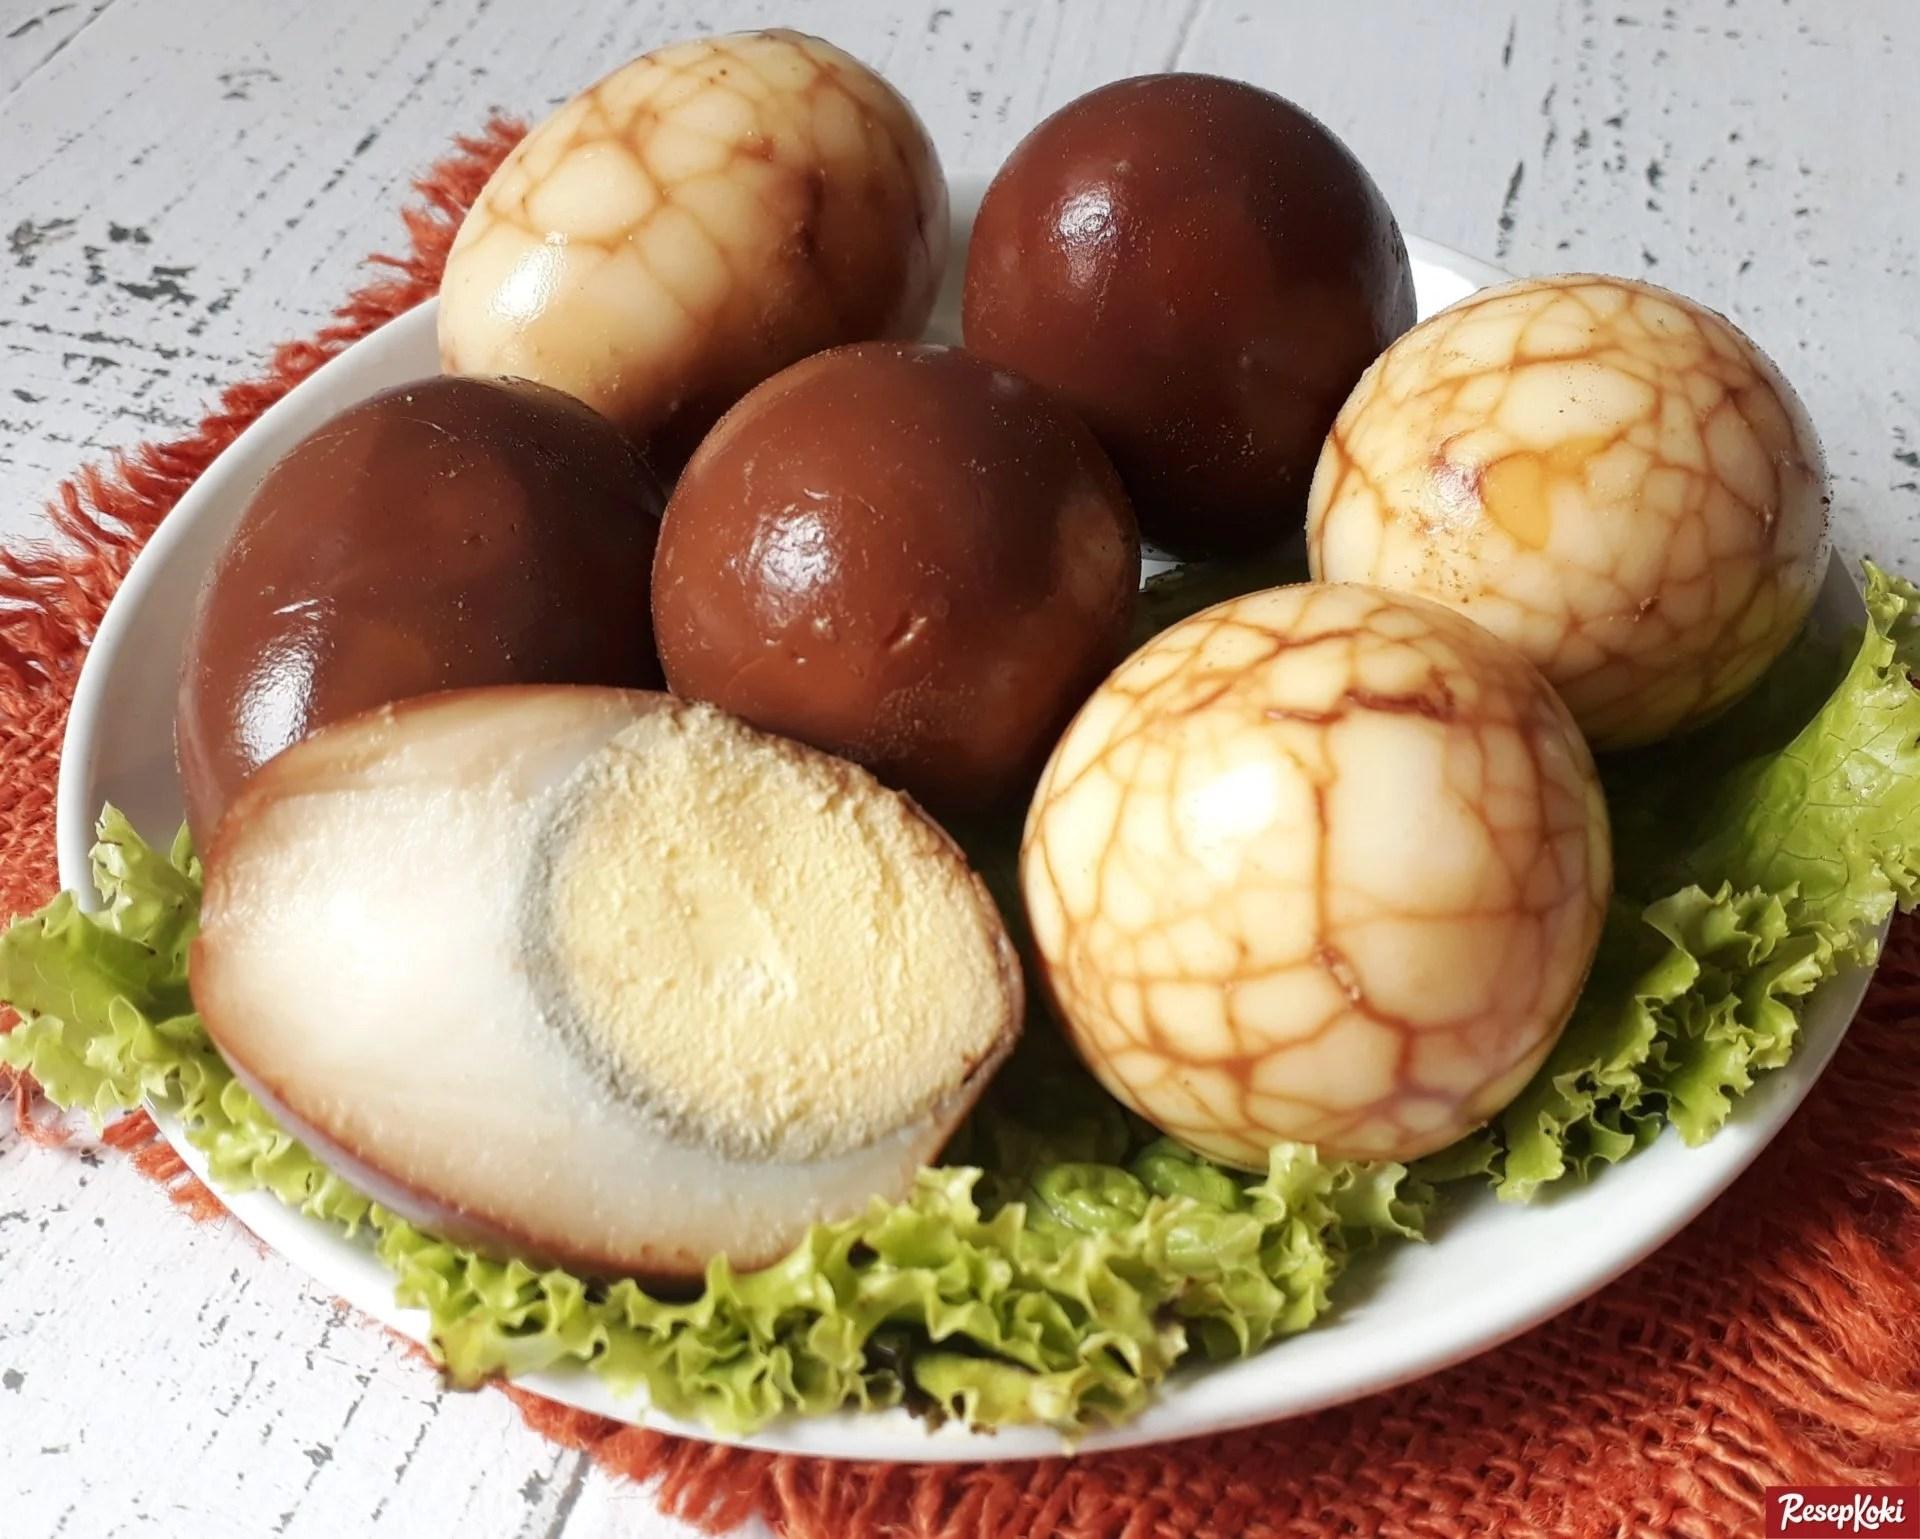 Pindang Telur Bumbu Merasuk Hingga Dalam Resep Resepkoki